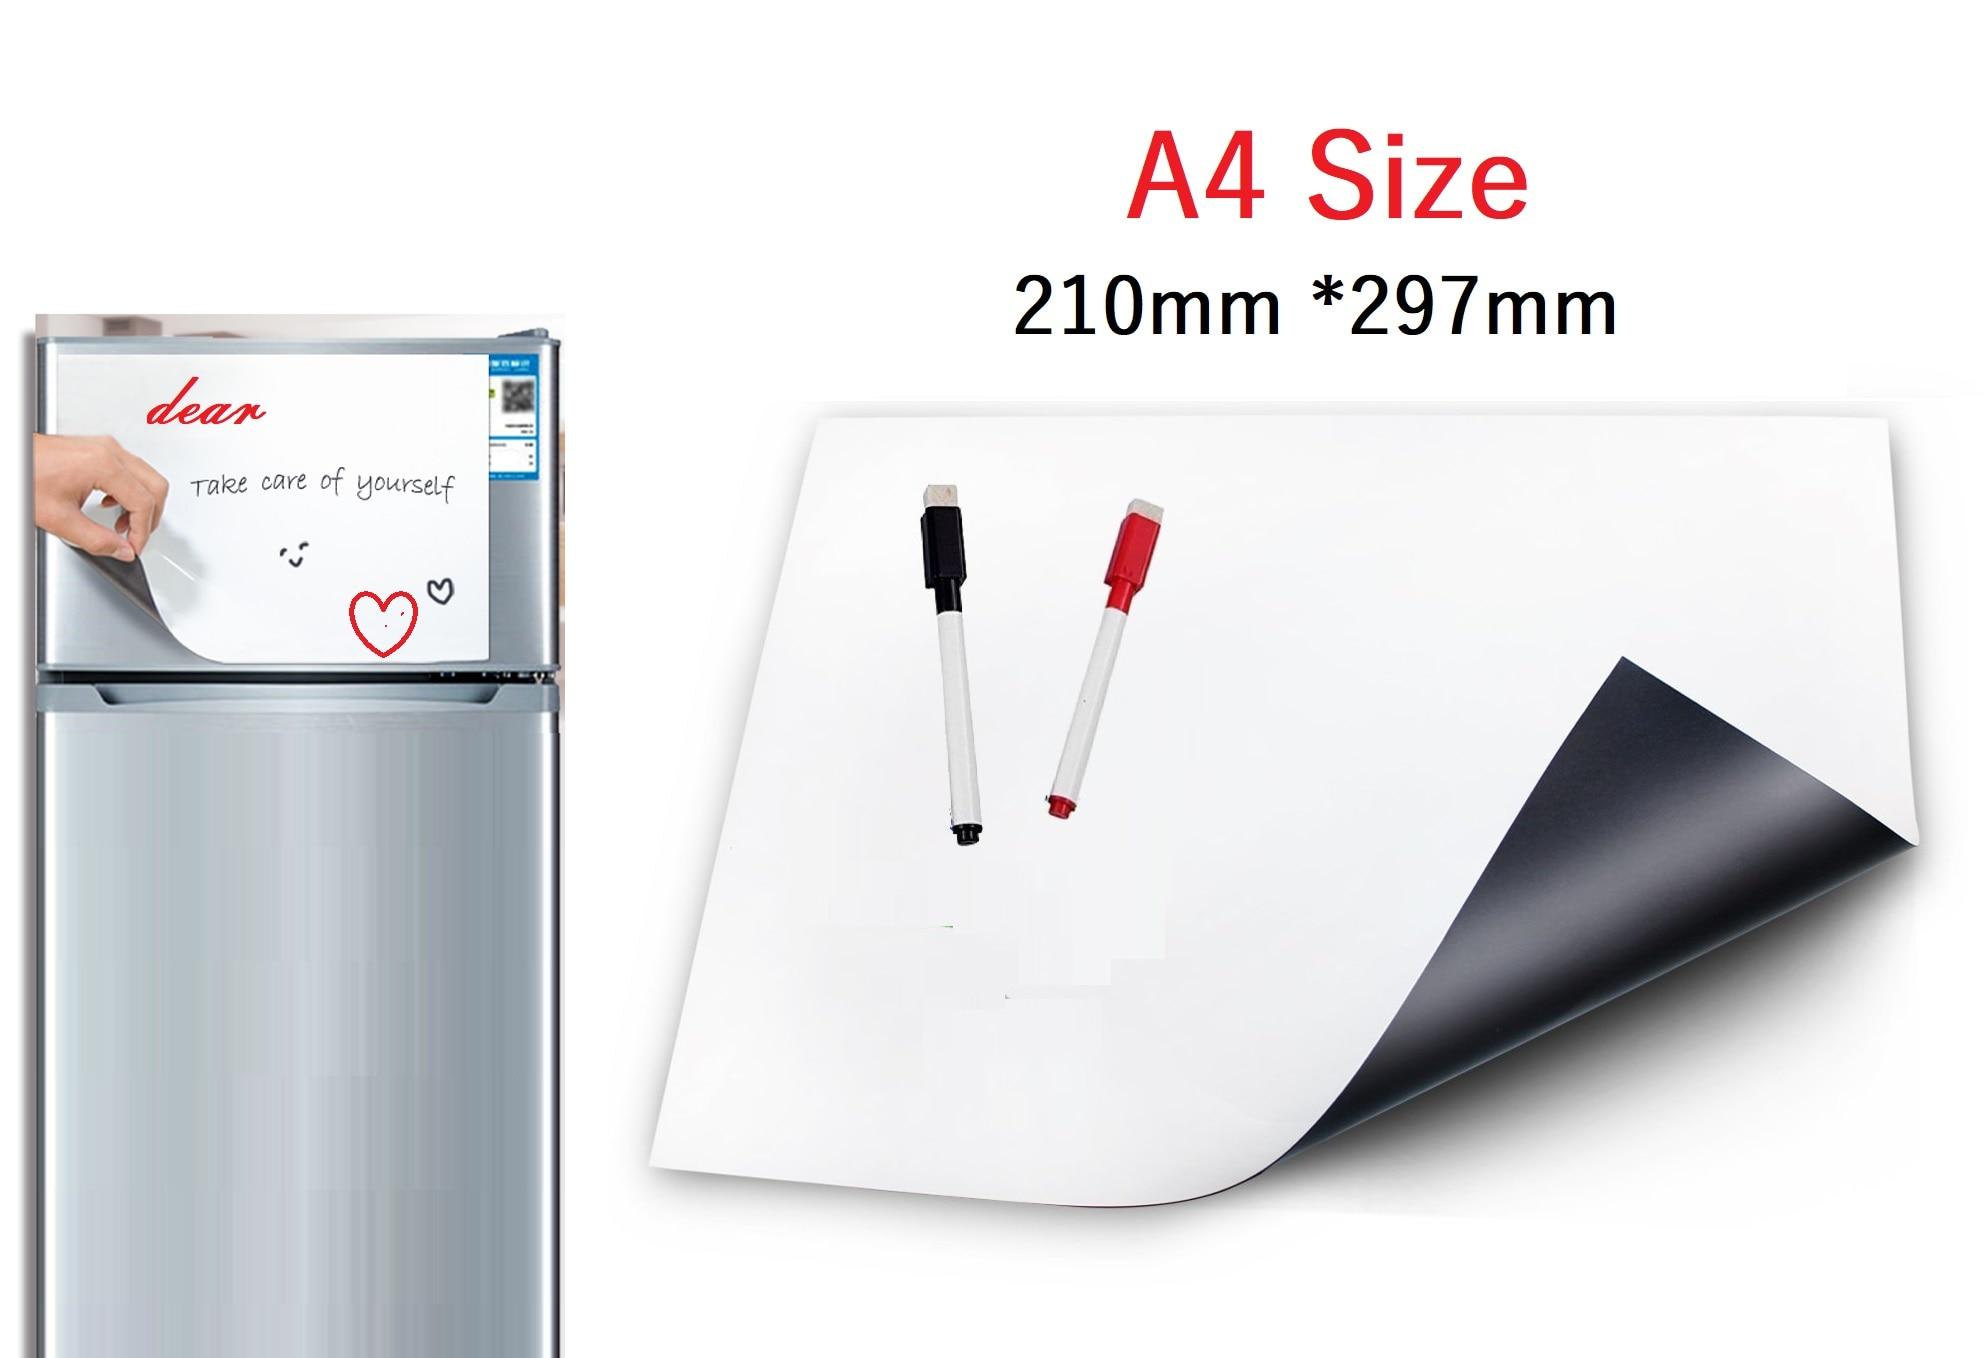 Магнитная доска WonYean A4 для холодильника, магнитная доска для записей на кухне, 2 маркера